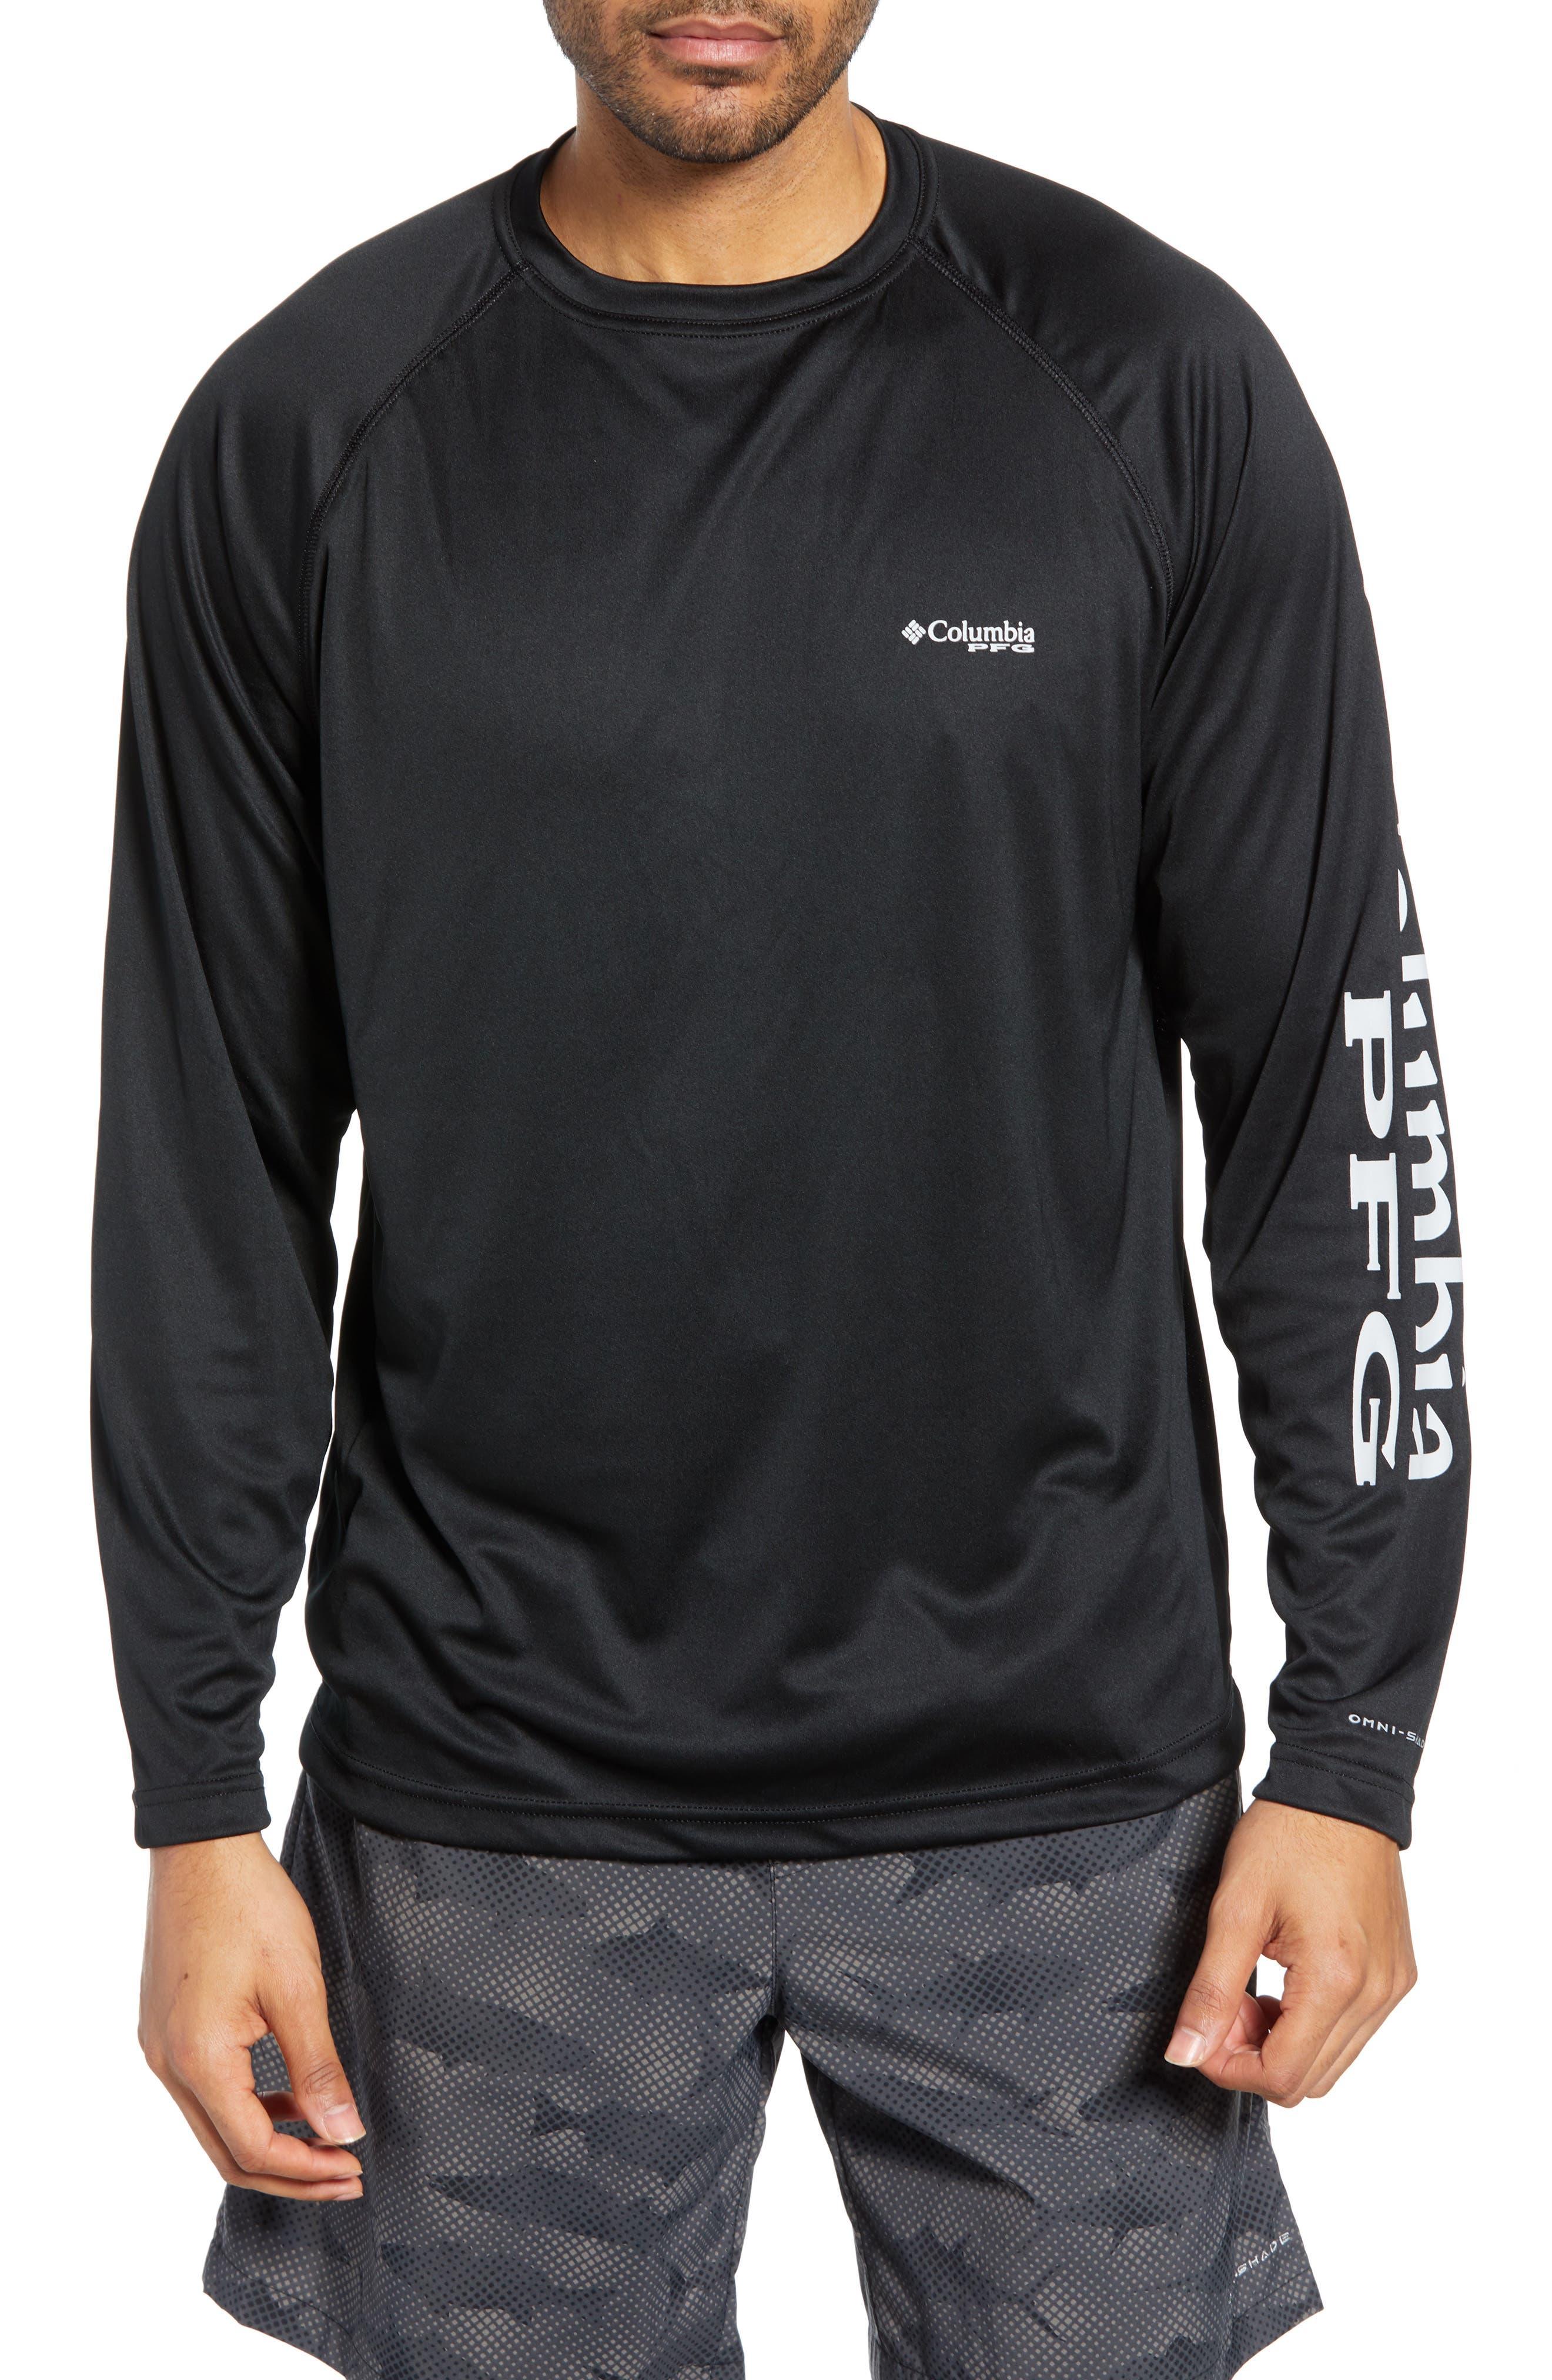 Columbia Pfg Terminal Tackle Performance Long Sleeve T-Shirt, Black